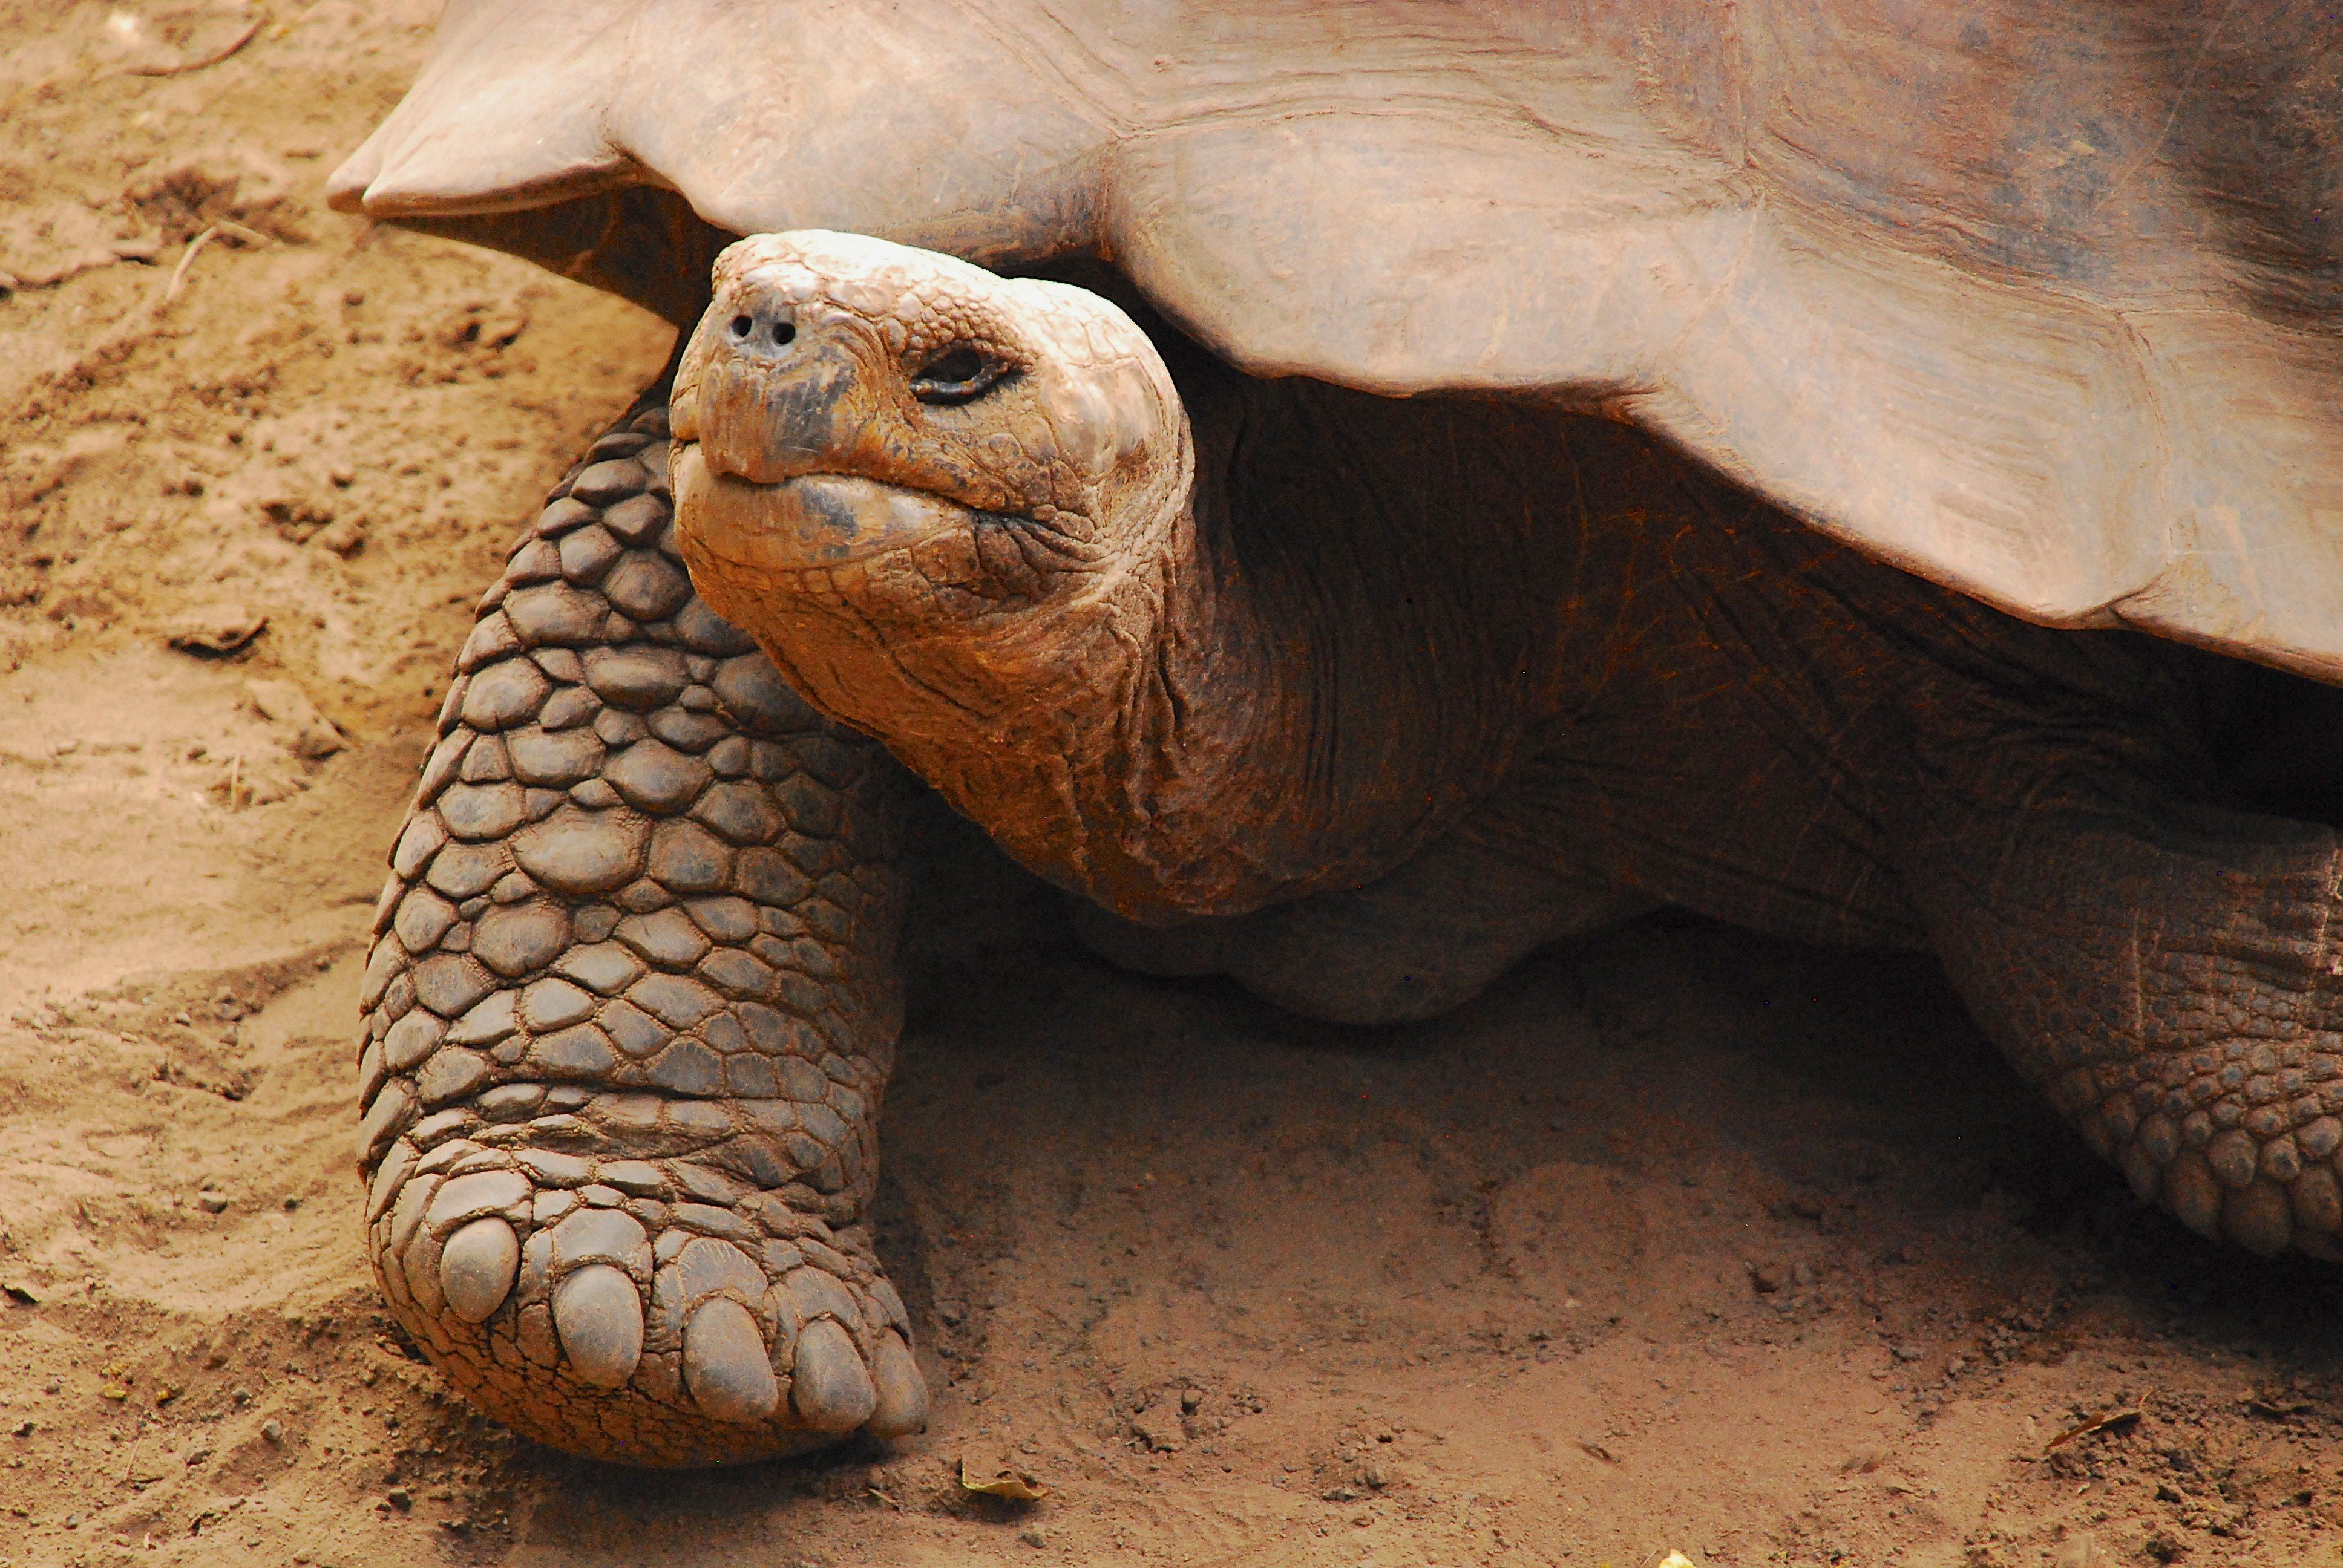 Tortoise in Santa Cruz Island, Galapagos tour, Ecuador